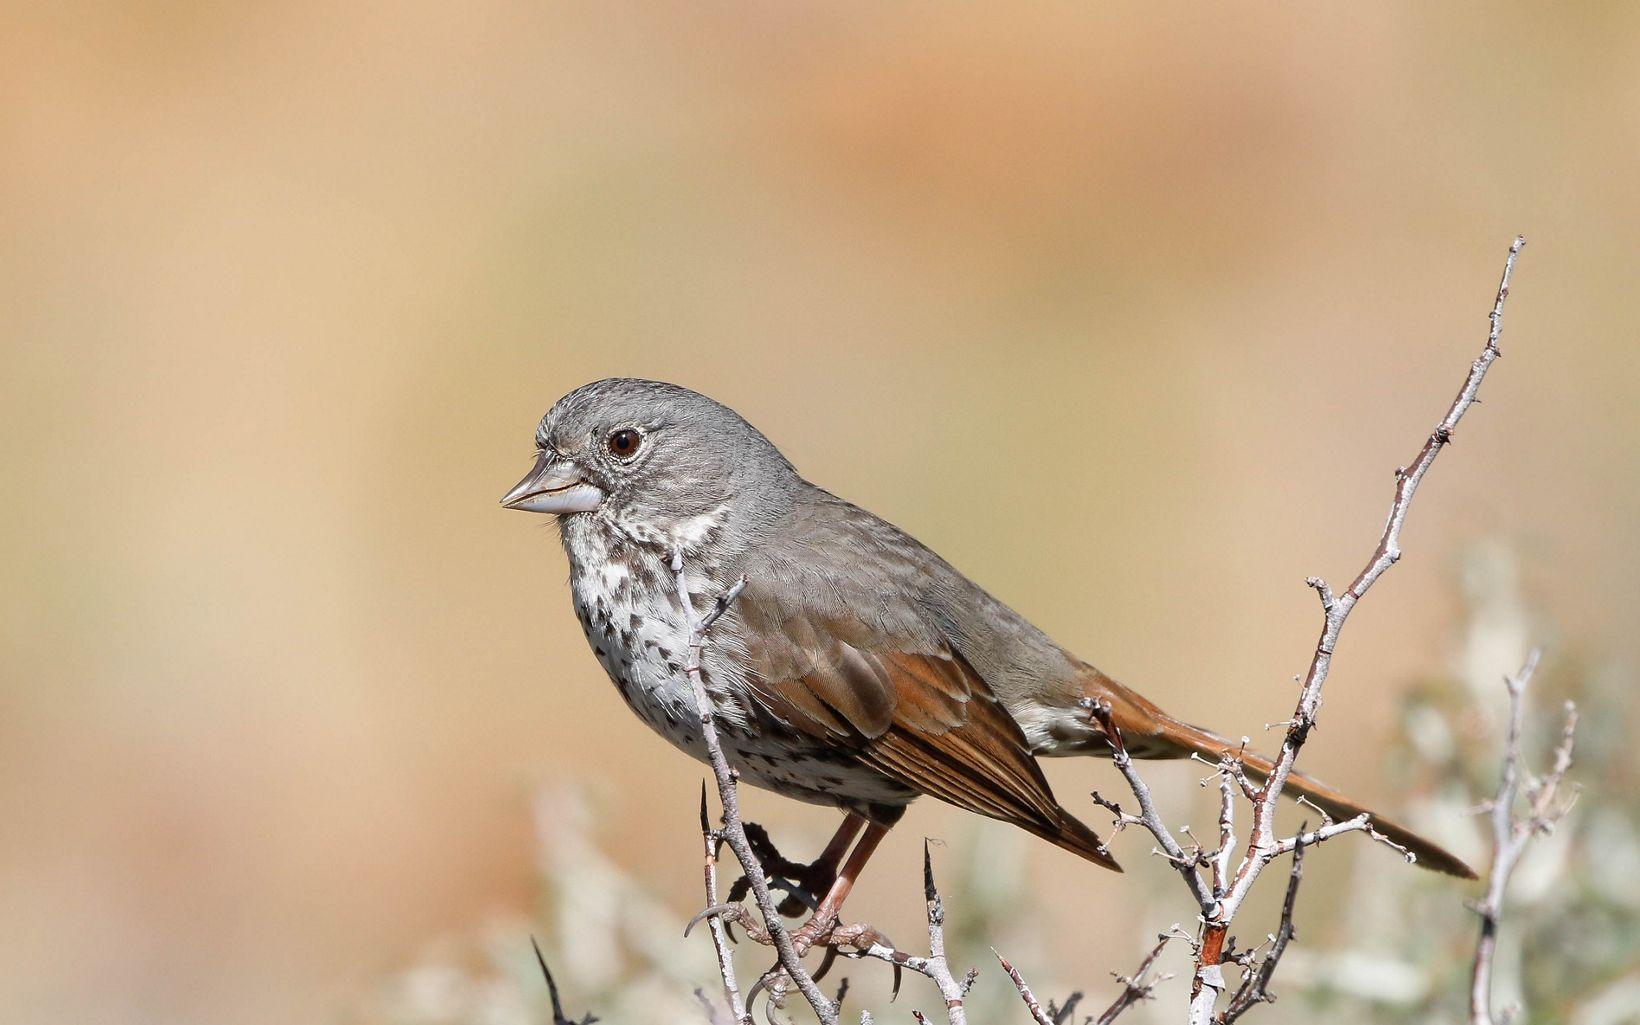 A brown bird rests on a bush.